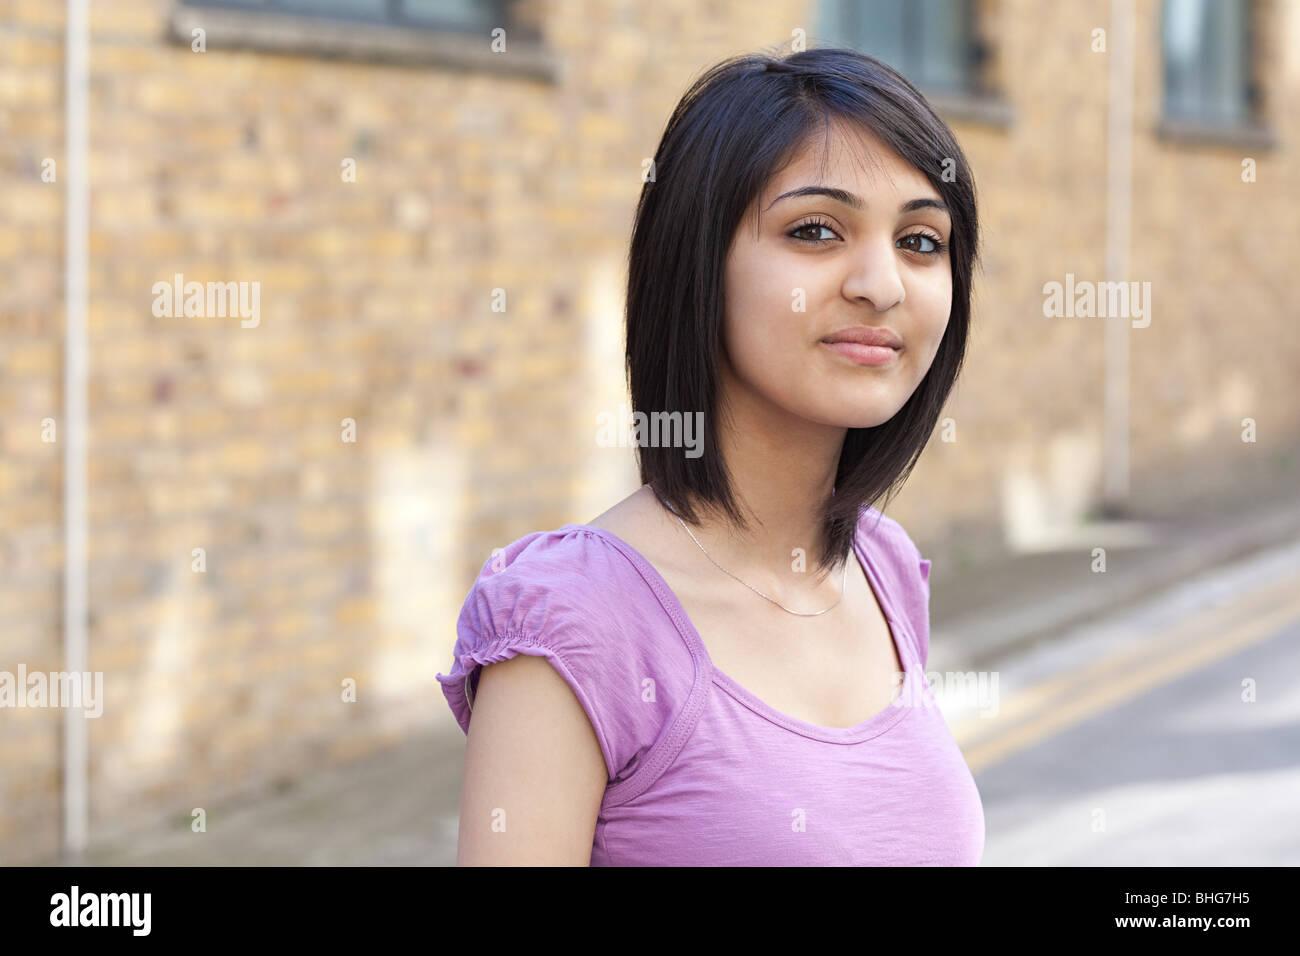 Portrait of teenage girl in street Stock Photo